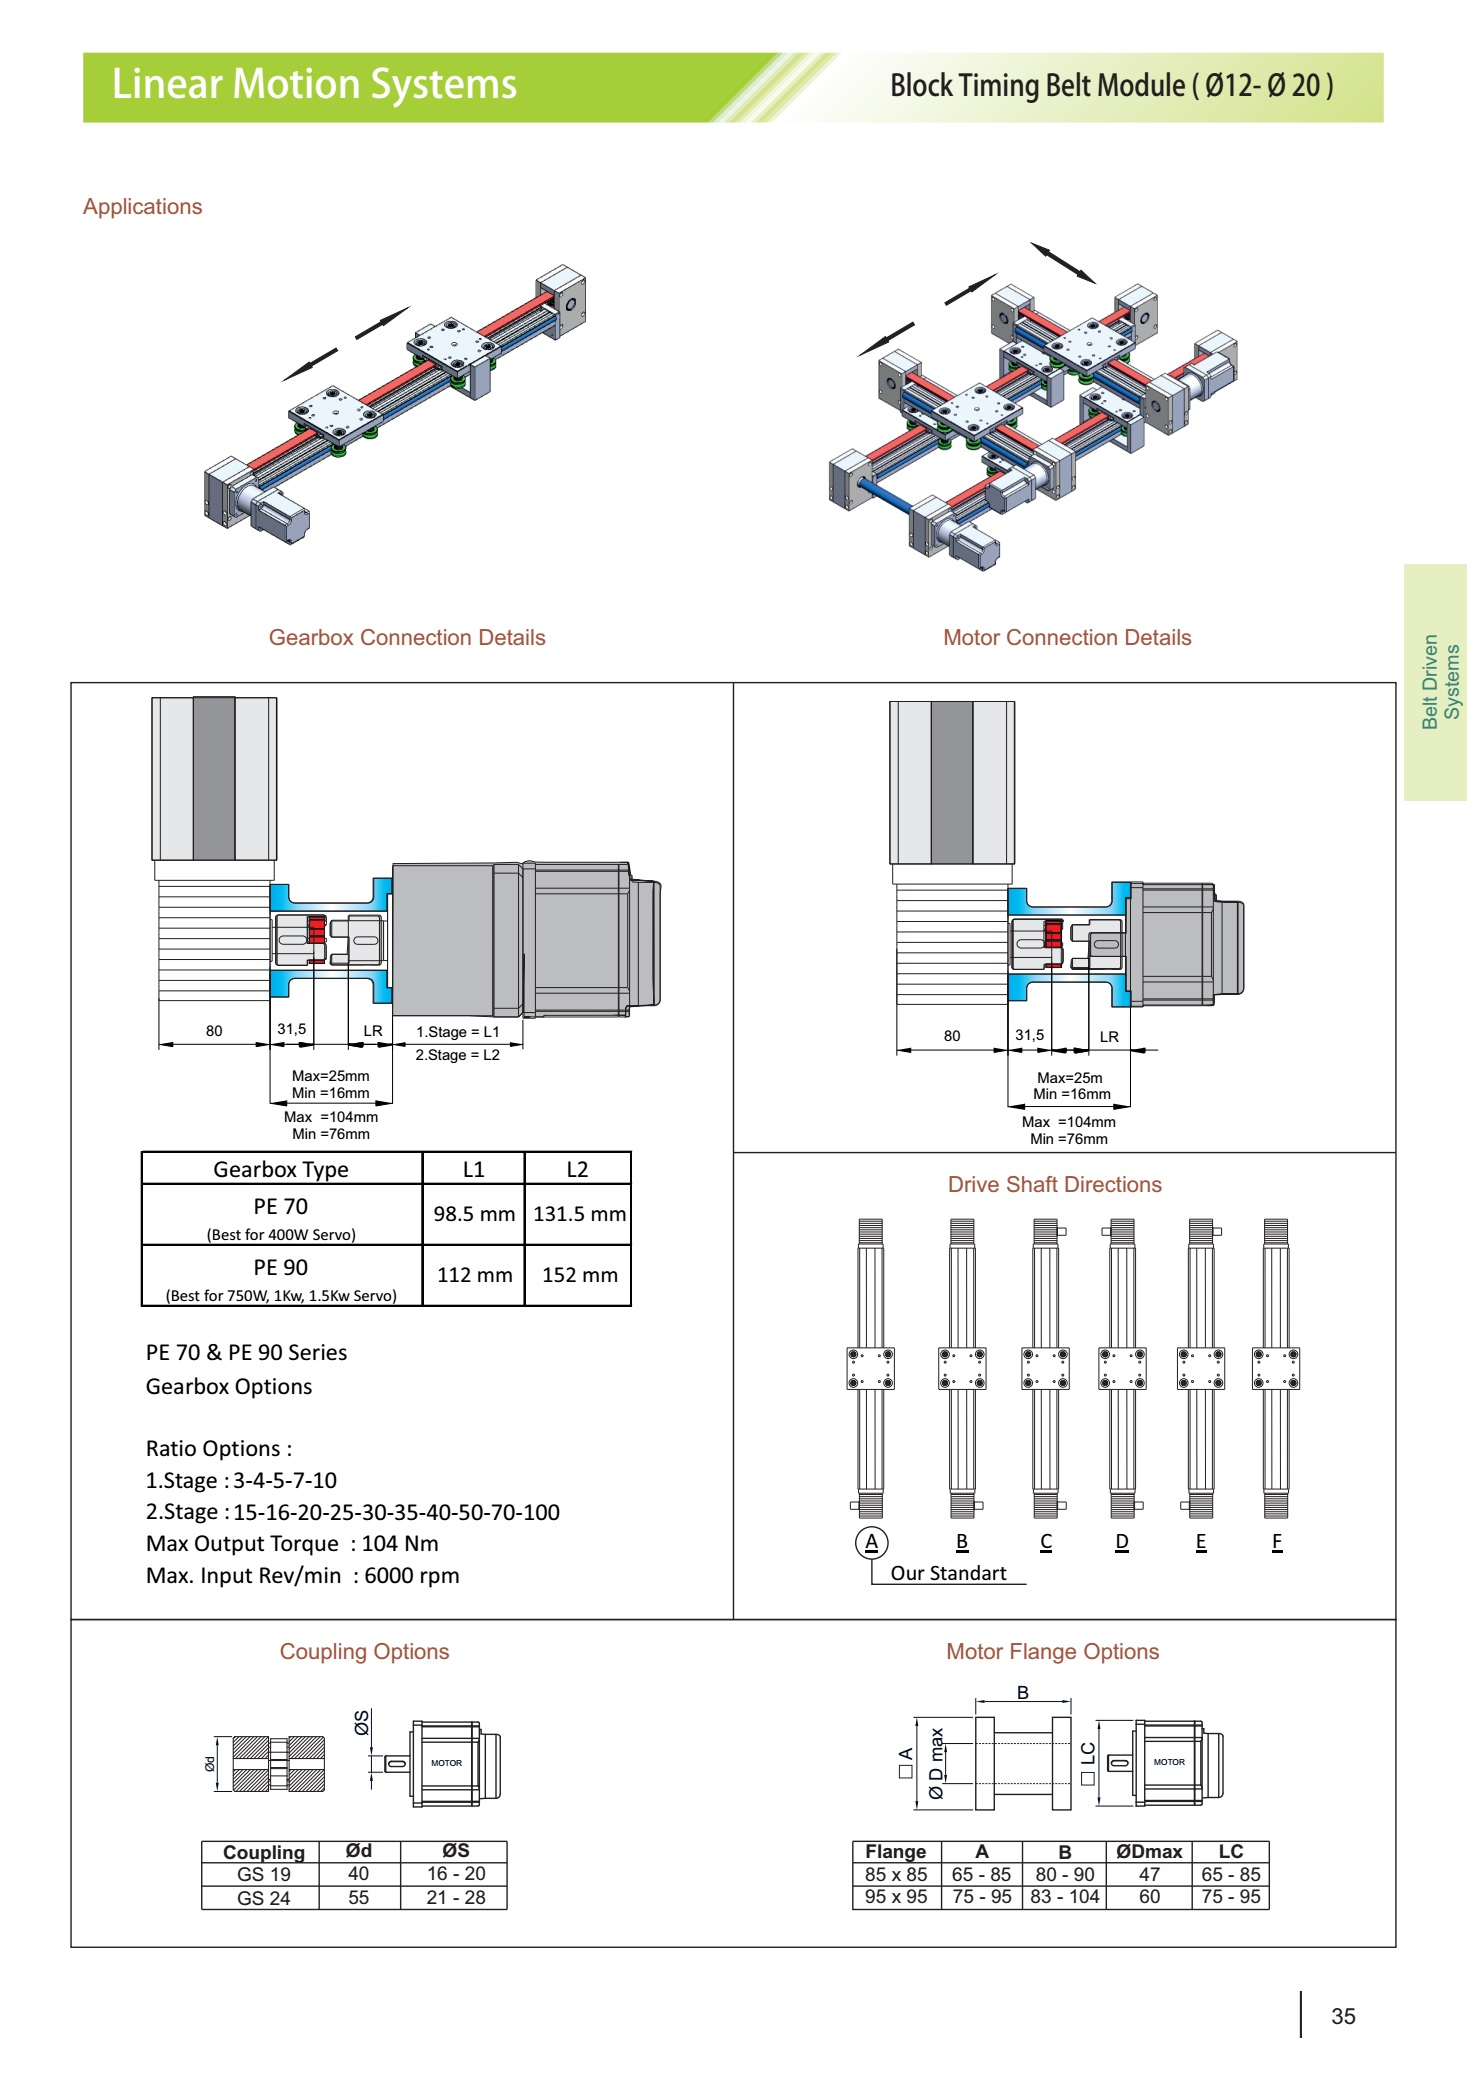 Linear Motion Systems Block Timing Belt Module 12 20 Mm Elega Diagram System 3